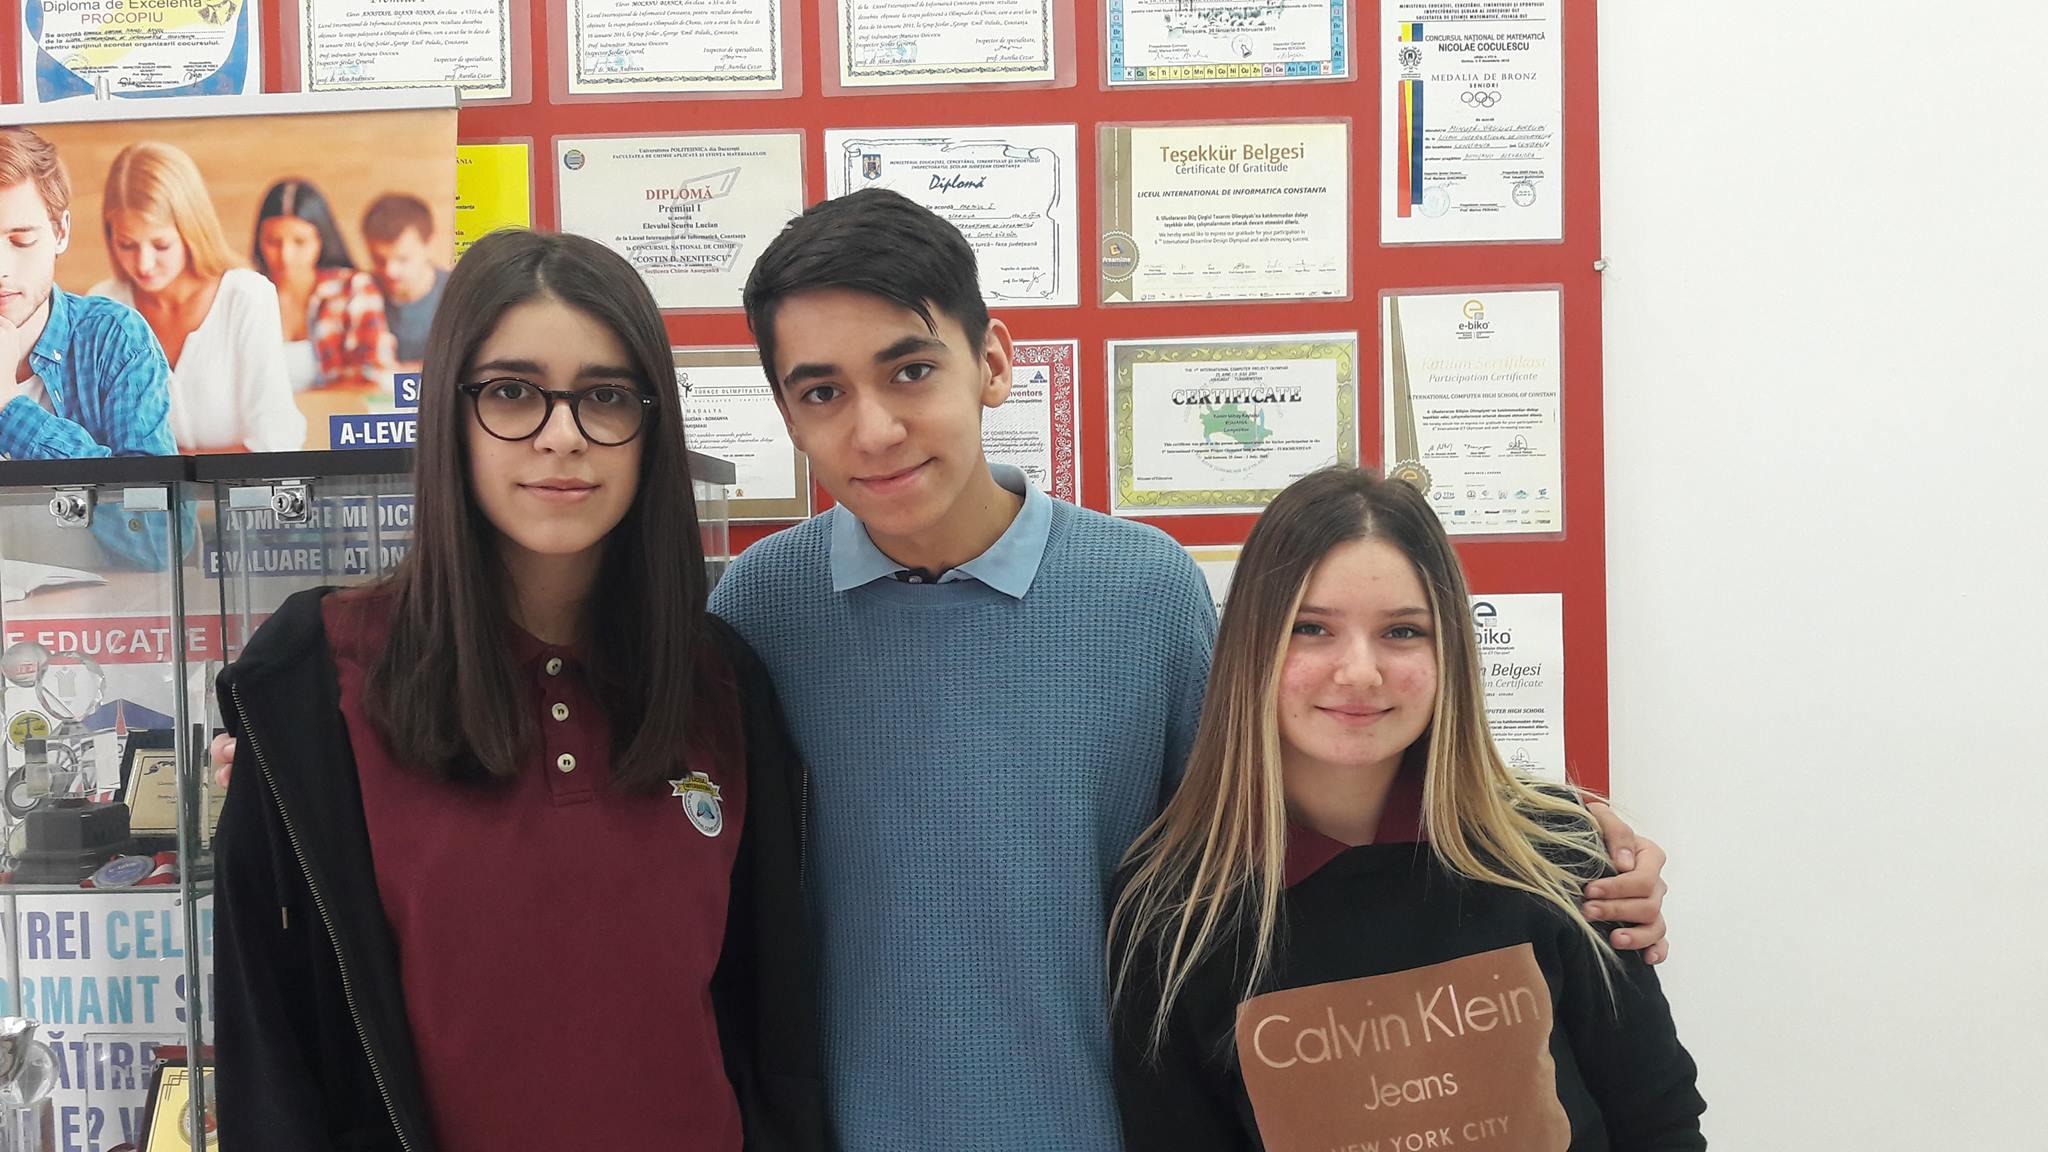 Obtinut Premiul I si calificarea la olimpiada nationala de limba turca